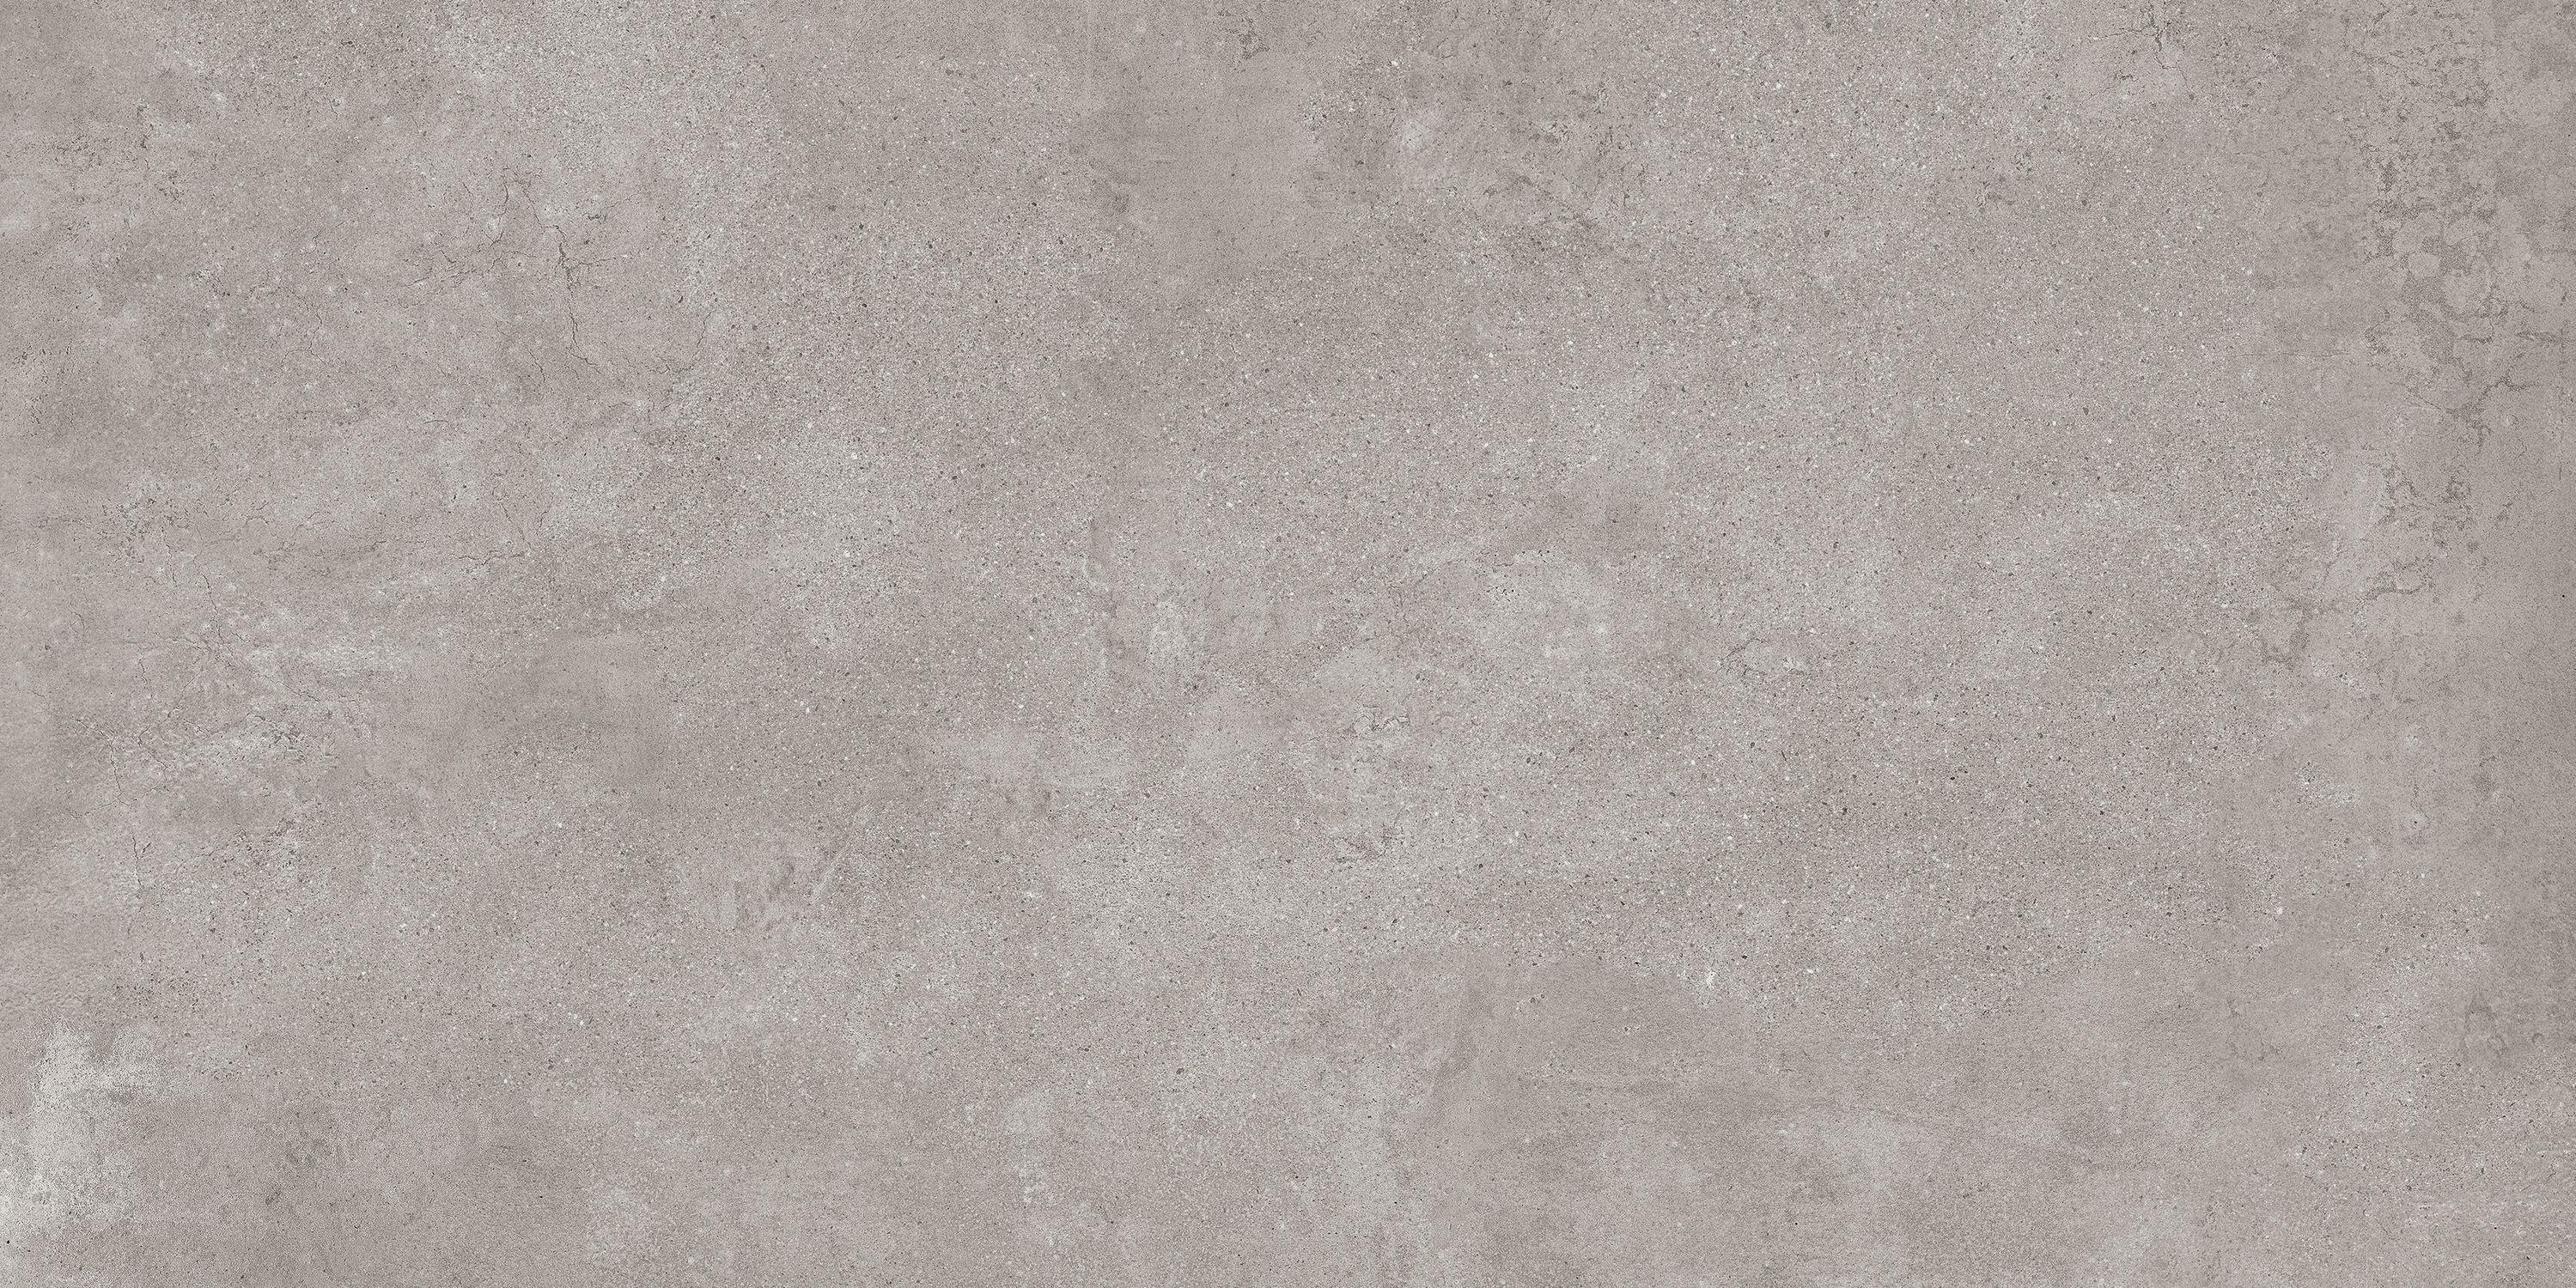 Texture pavimento gres grigio: texture pavimento gres grigio